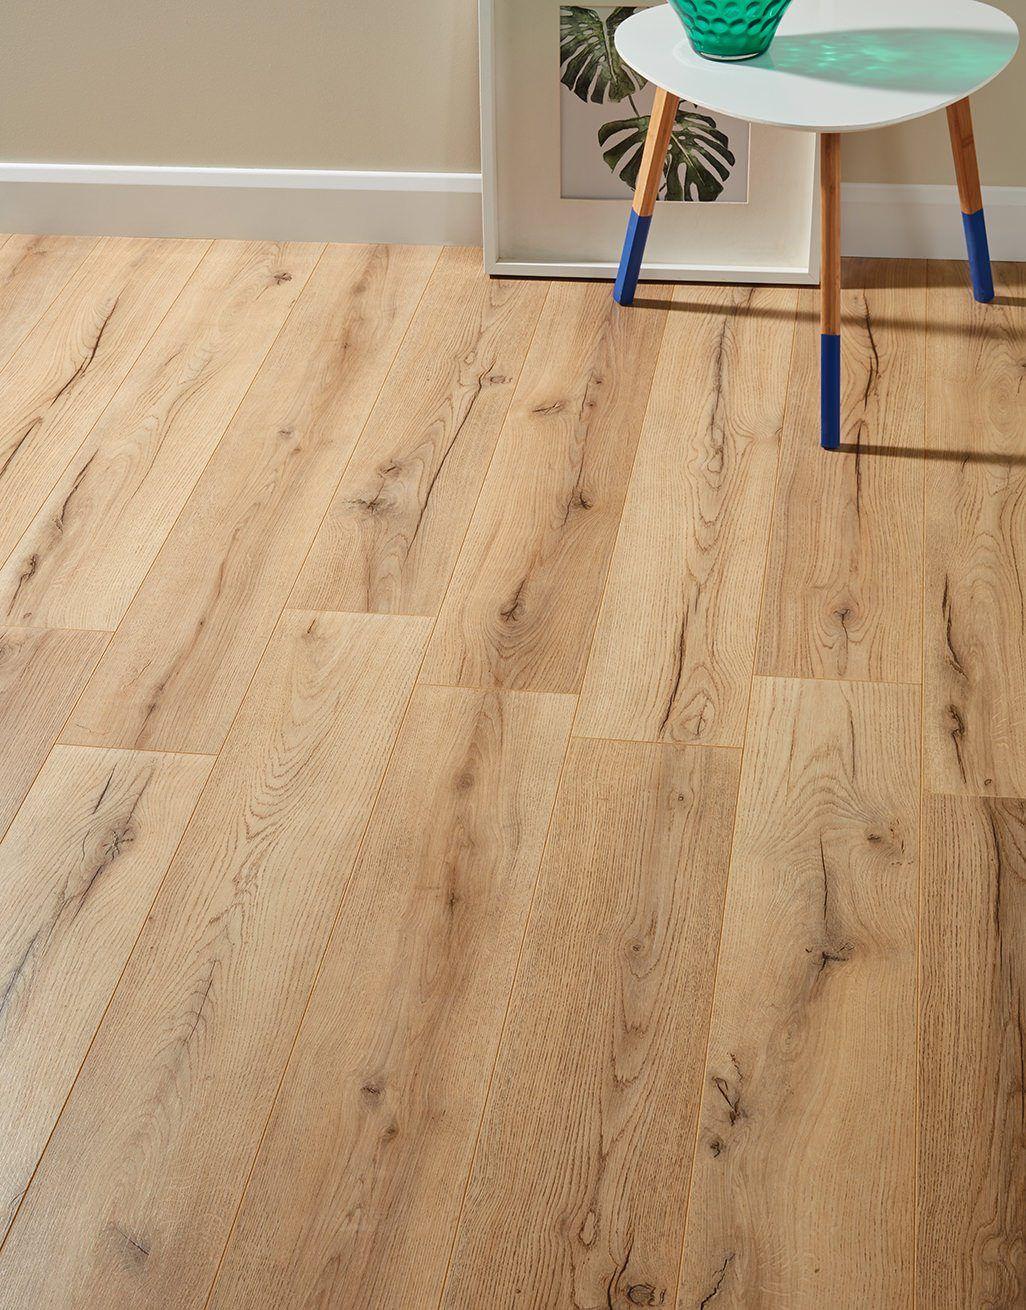 Loft Rustic Oak Laminate Flooring, Textured Laminate Flooring Rustic Oak